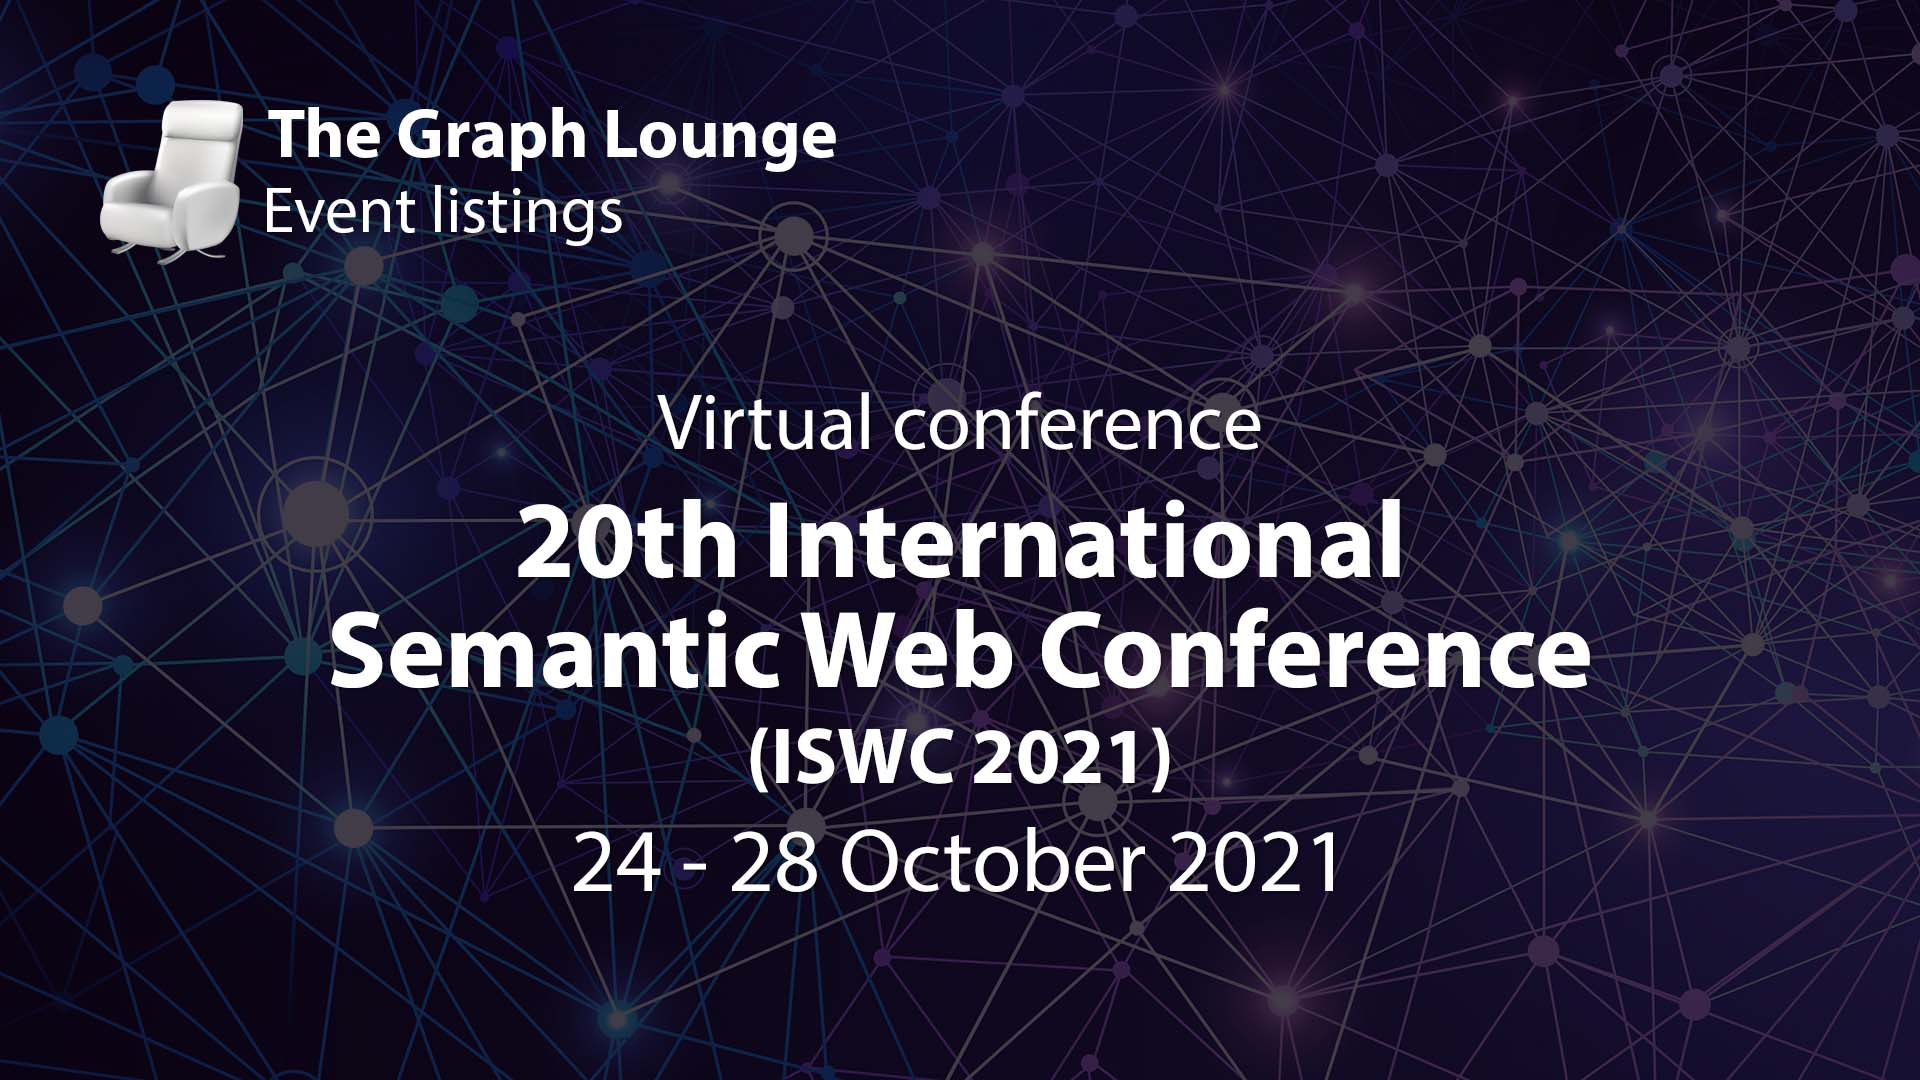 20th International Semantic Web Conference (ISWC 2021)